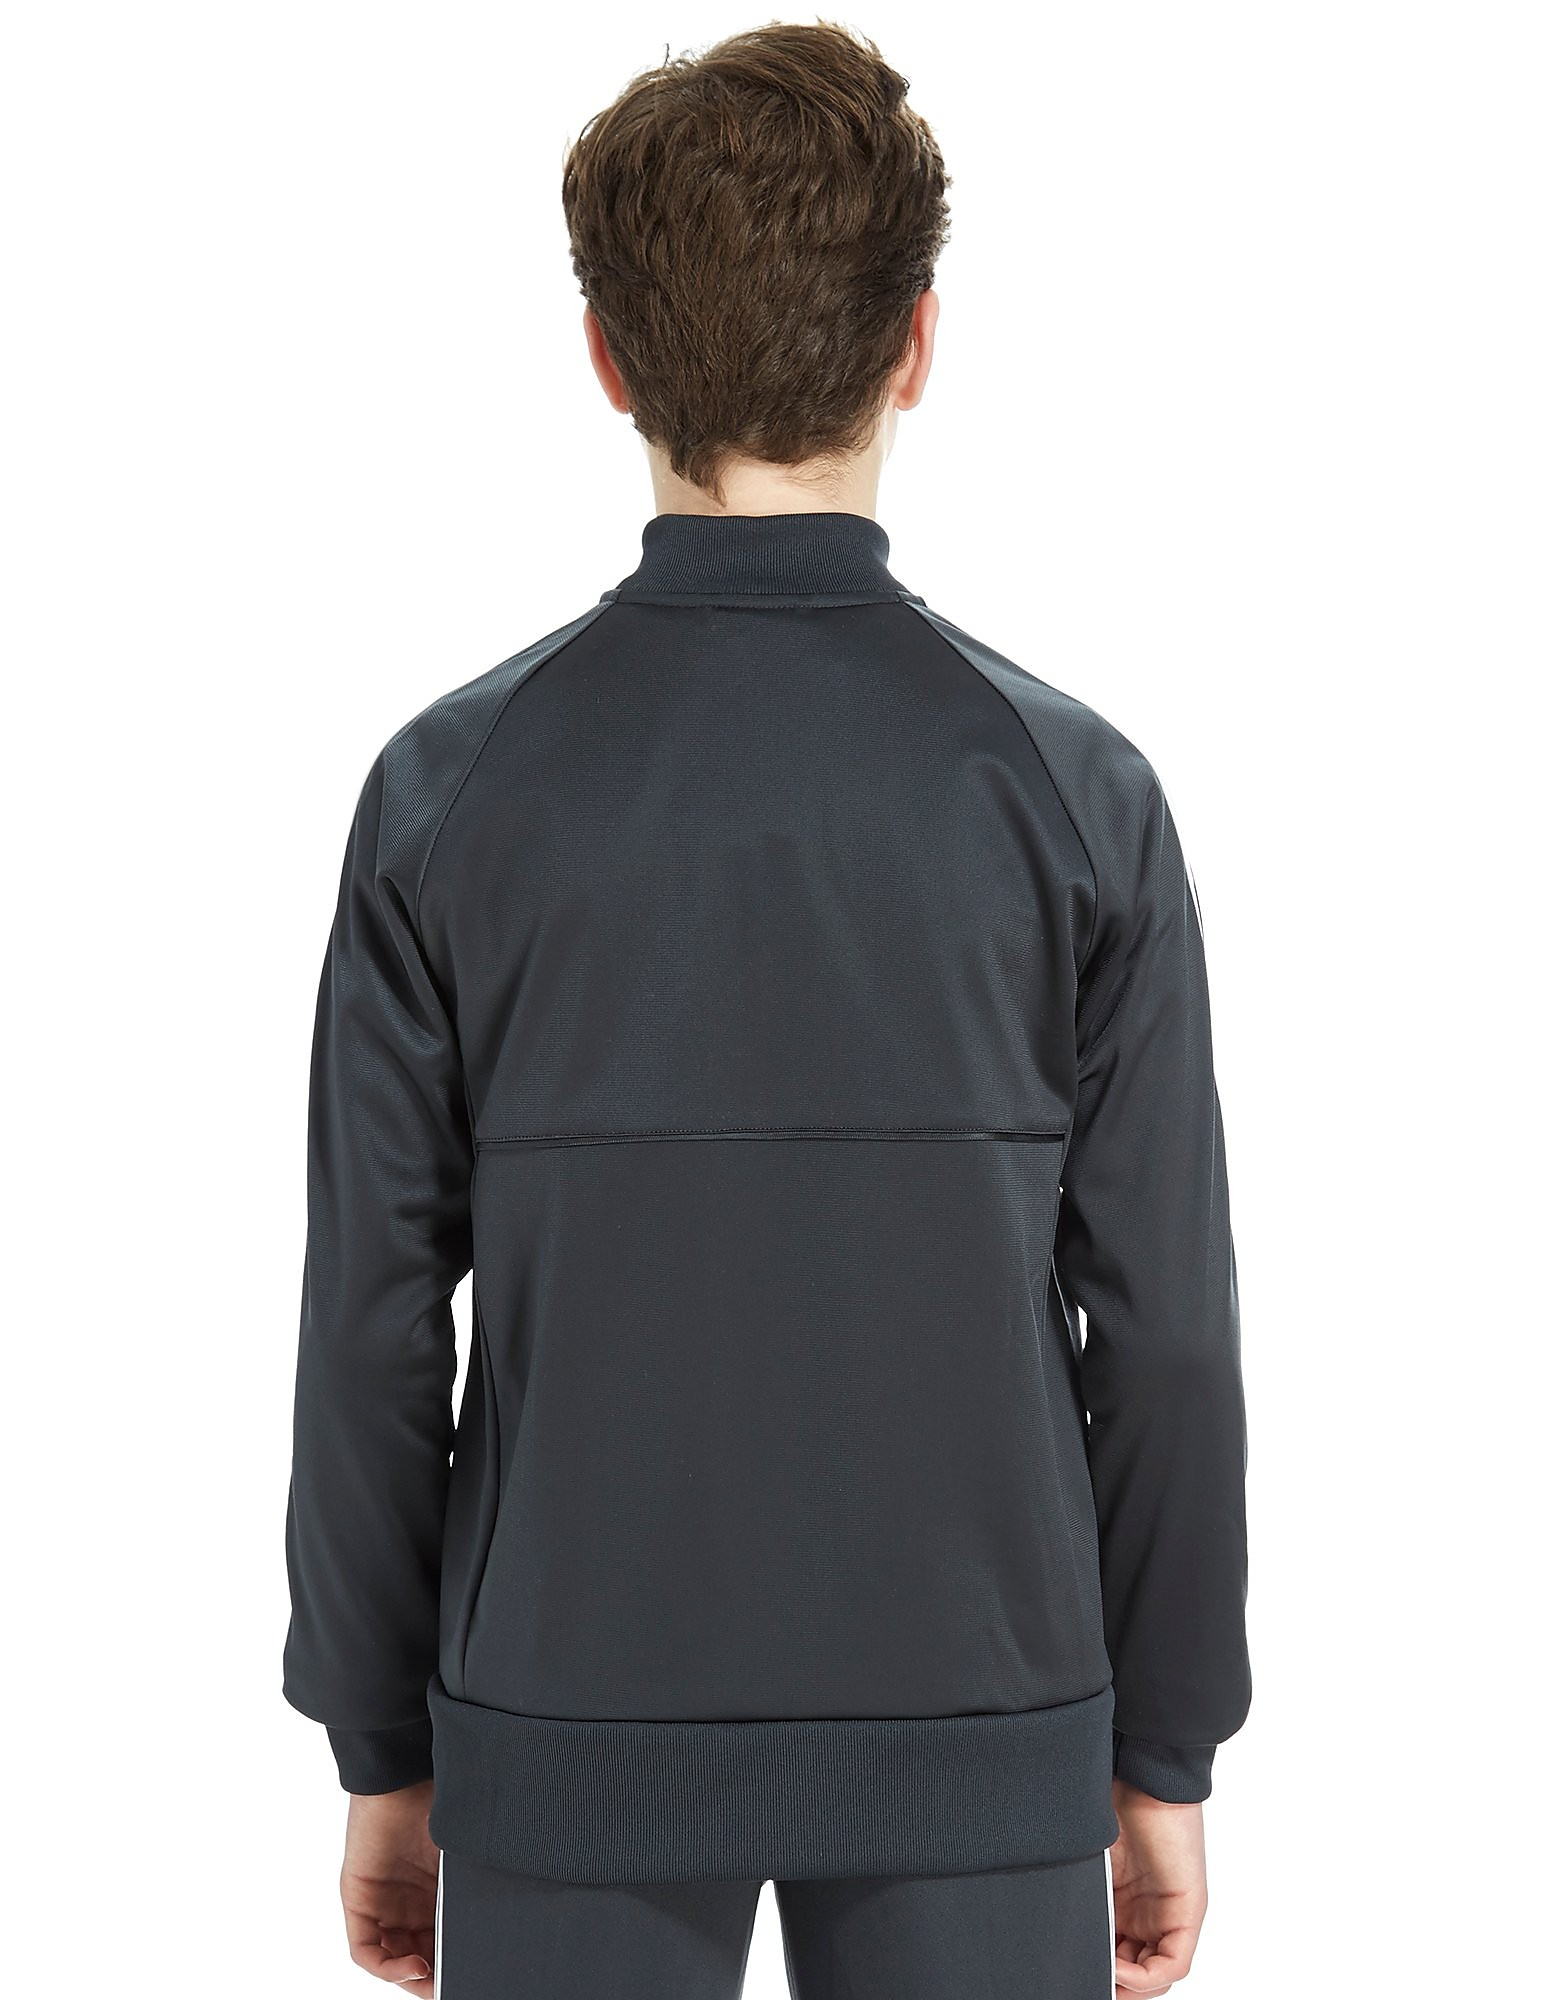 adidas Tango 1/2 Zip Jacket Enfant